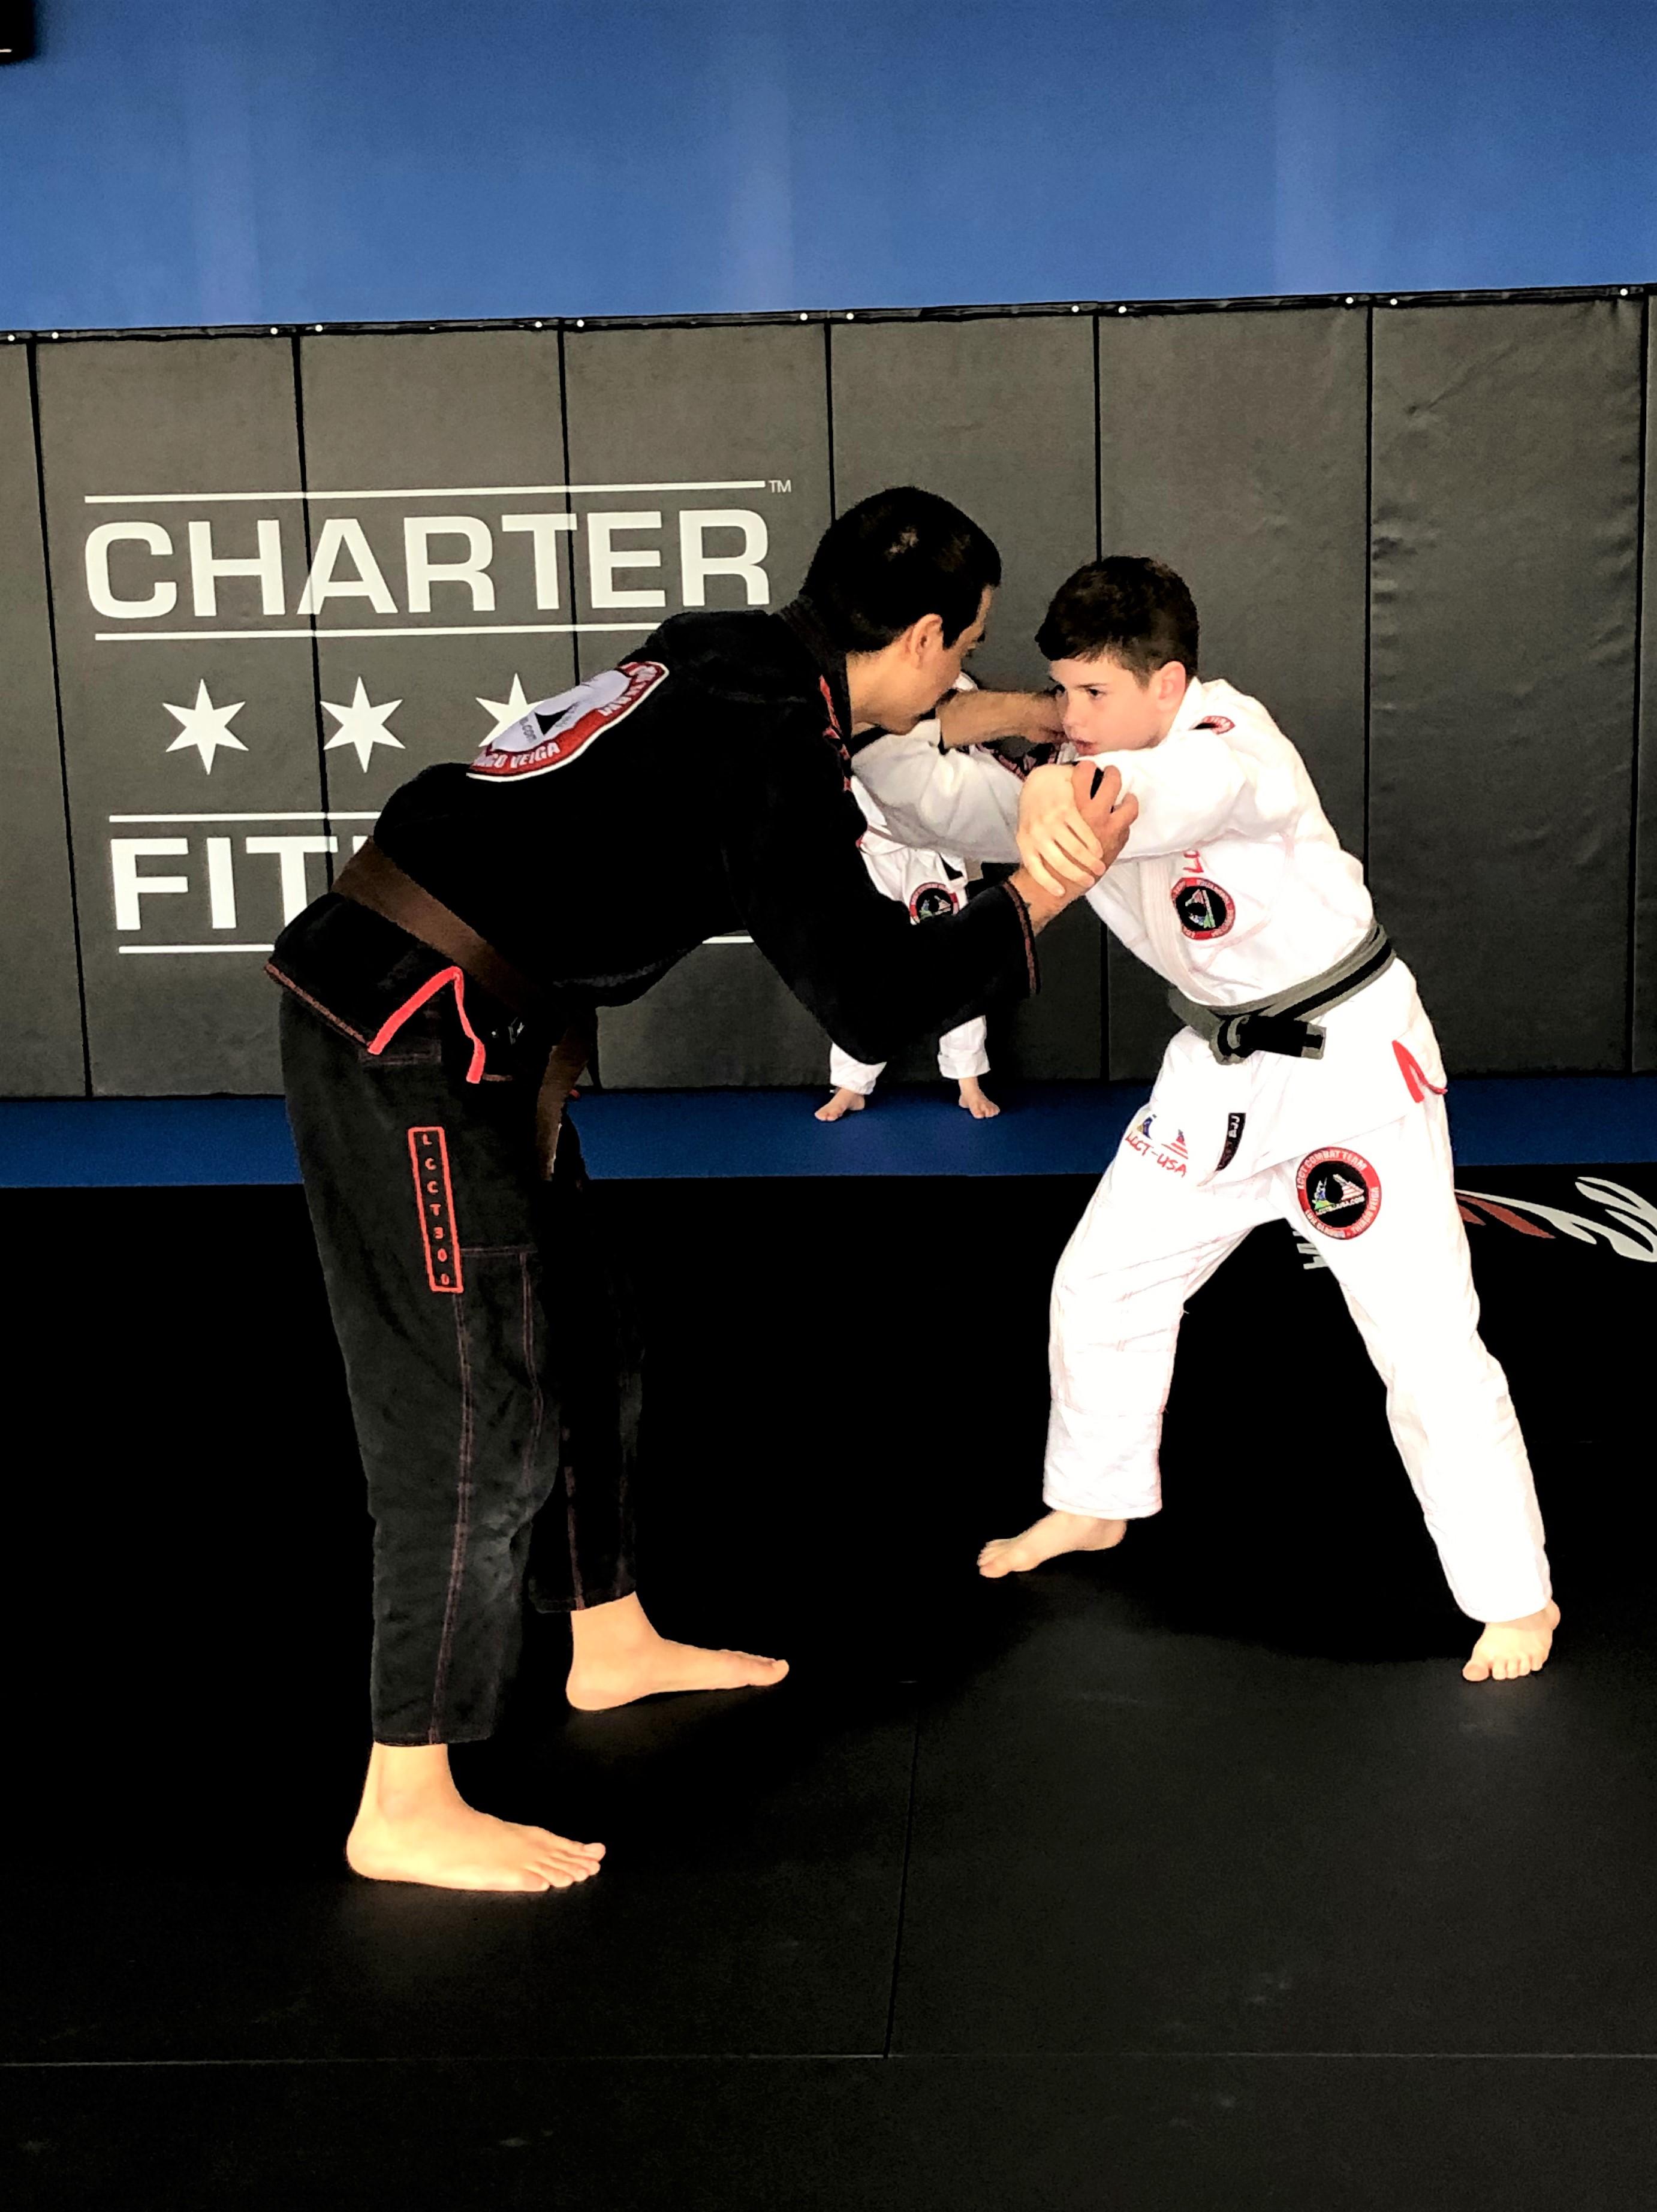 Jiu-Jitsu @ Charter Fitness Mundelein